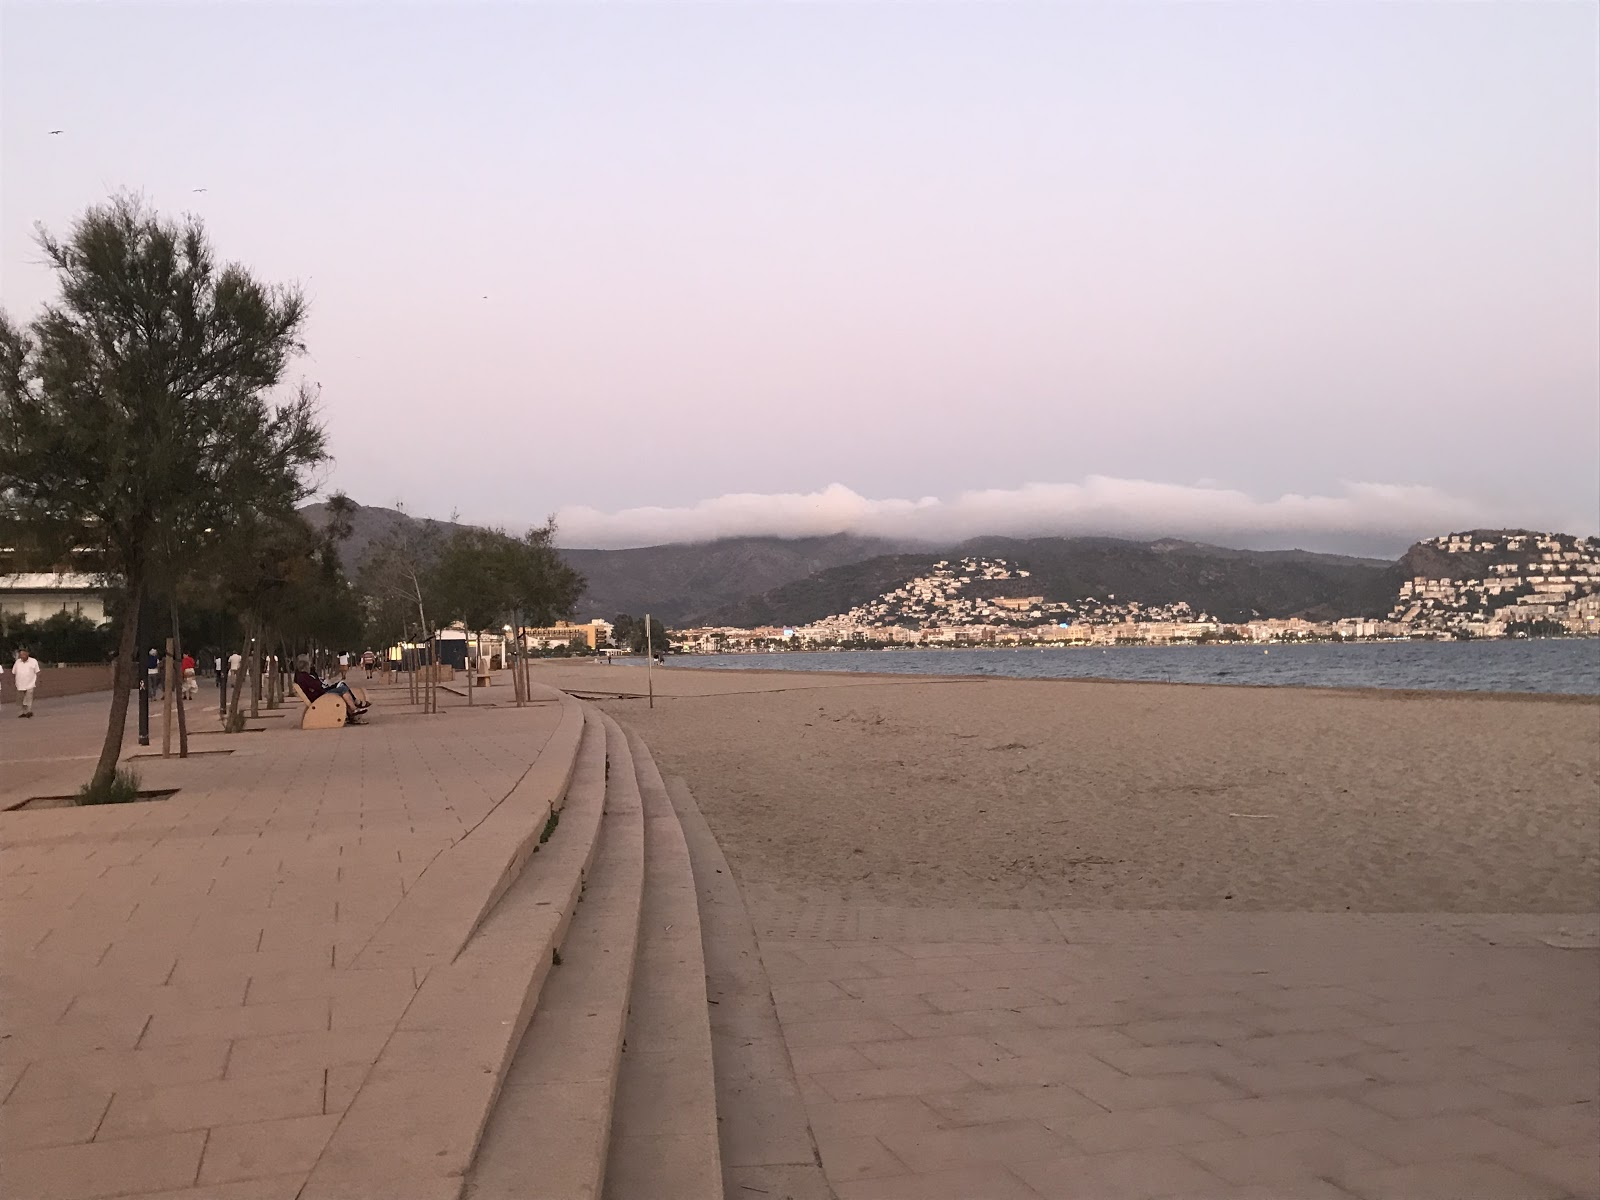 Glamview mijn week in foto's 4 -  roses strand